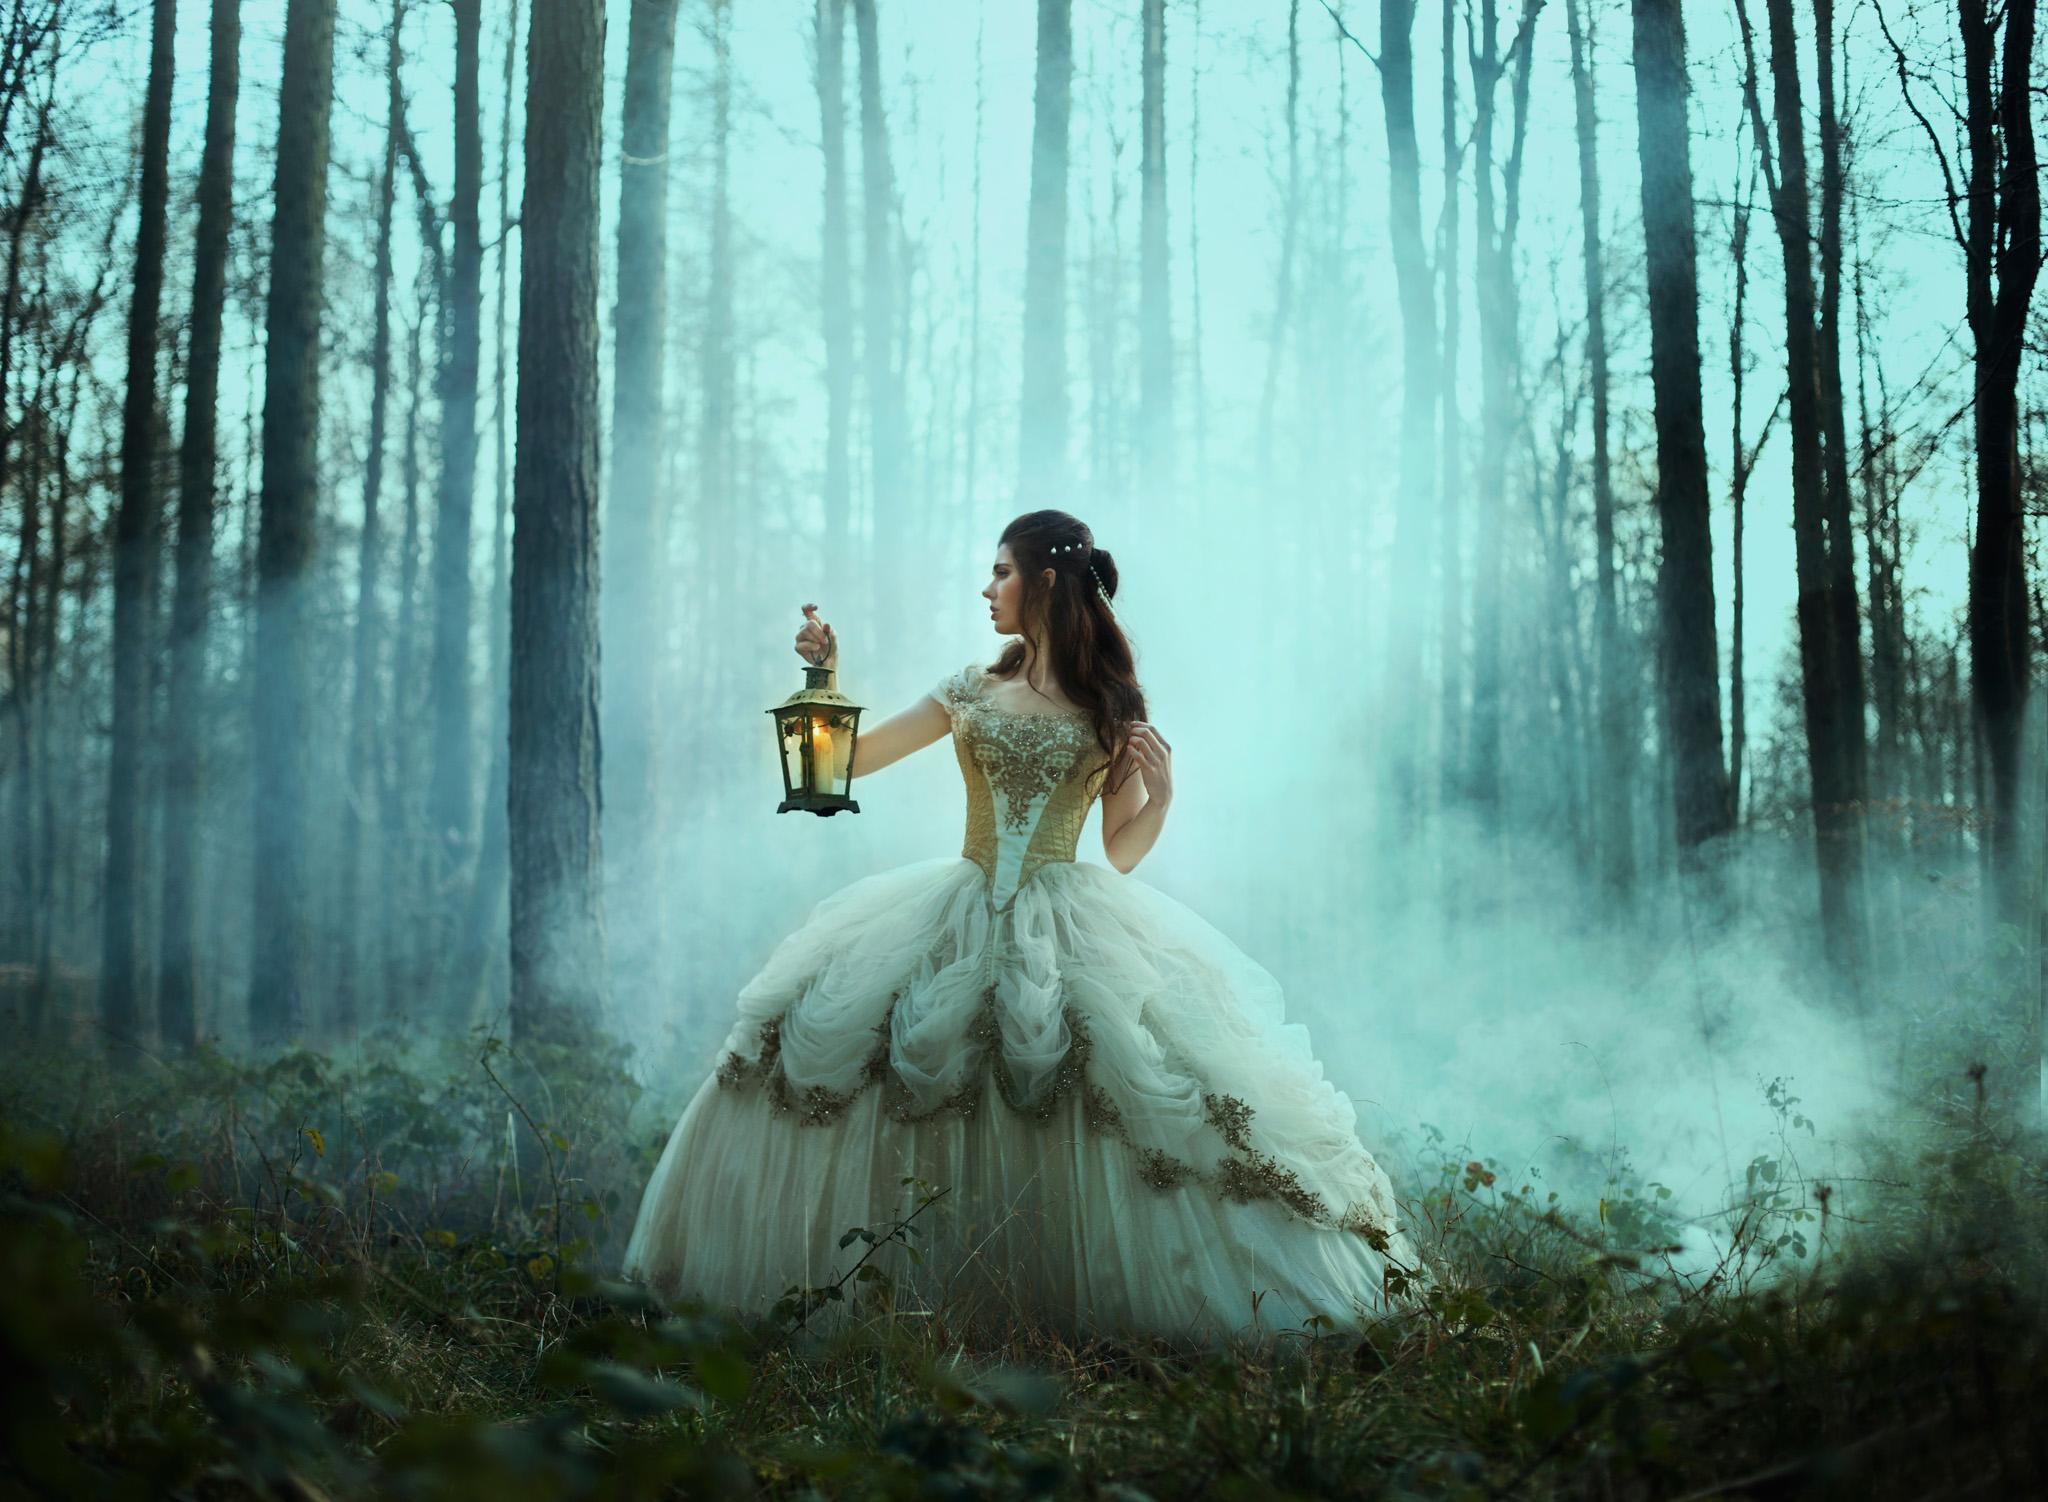 bella-kotak-fairytale-fairytales-labyrinth-david-bowie-sarah-beauty-beast-magic-magical-faerie-magazine-editorial-firefly-path-twilight-woods-lantern-ethereal-fairy-disney-ian-hencher-2s.jpg